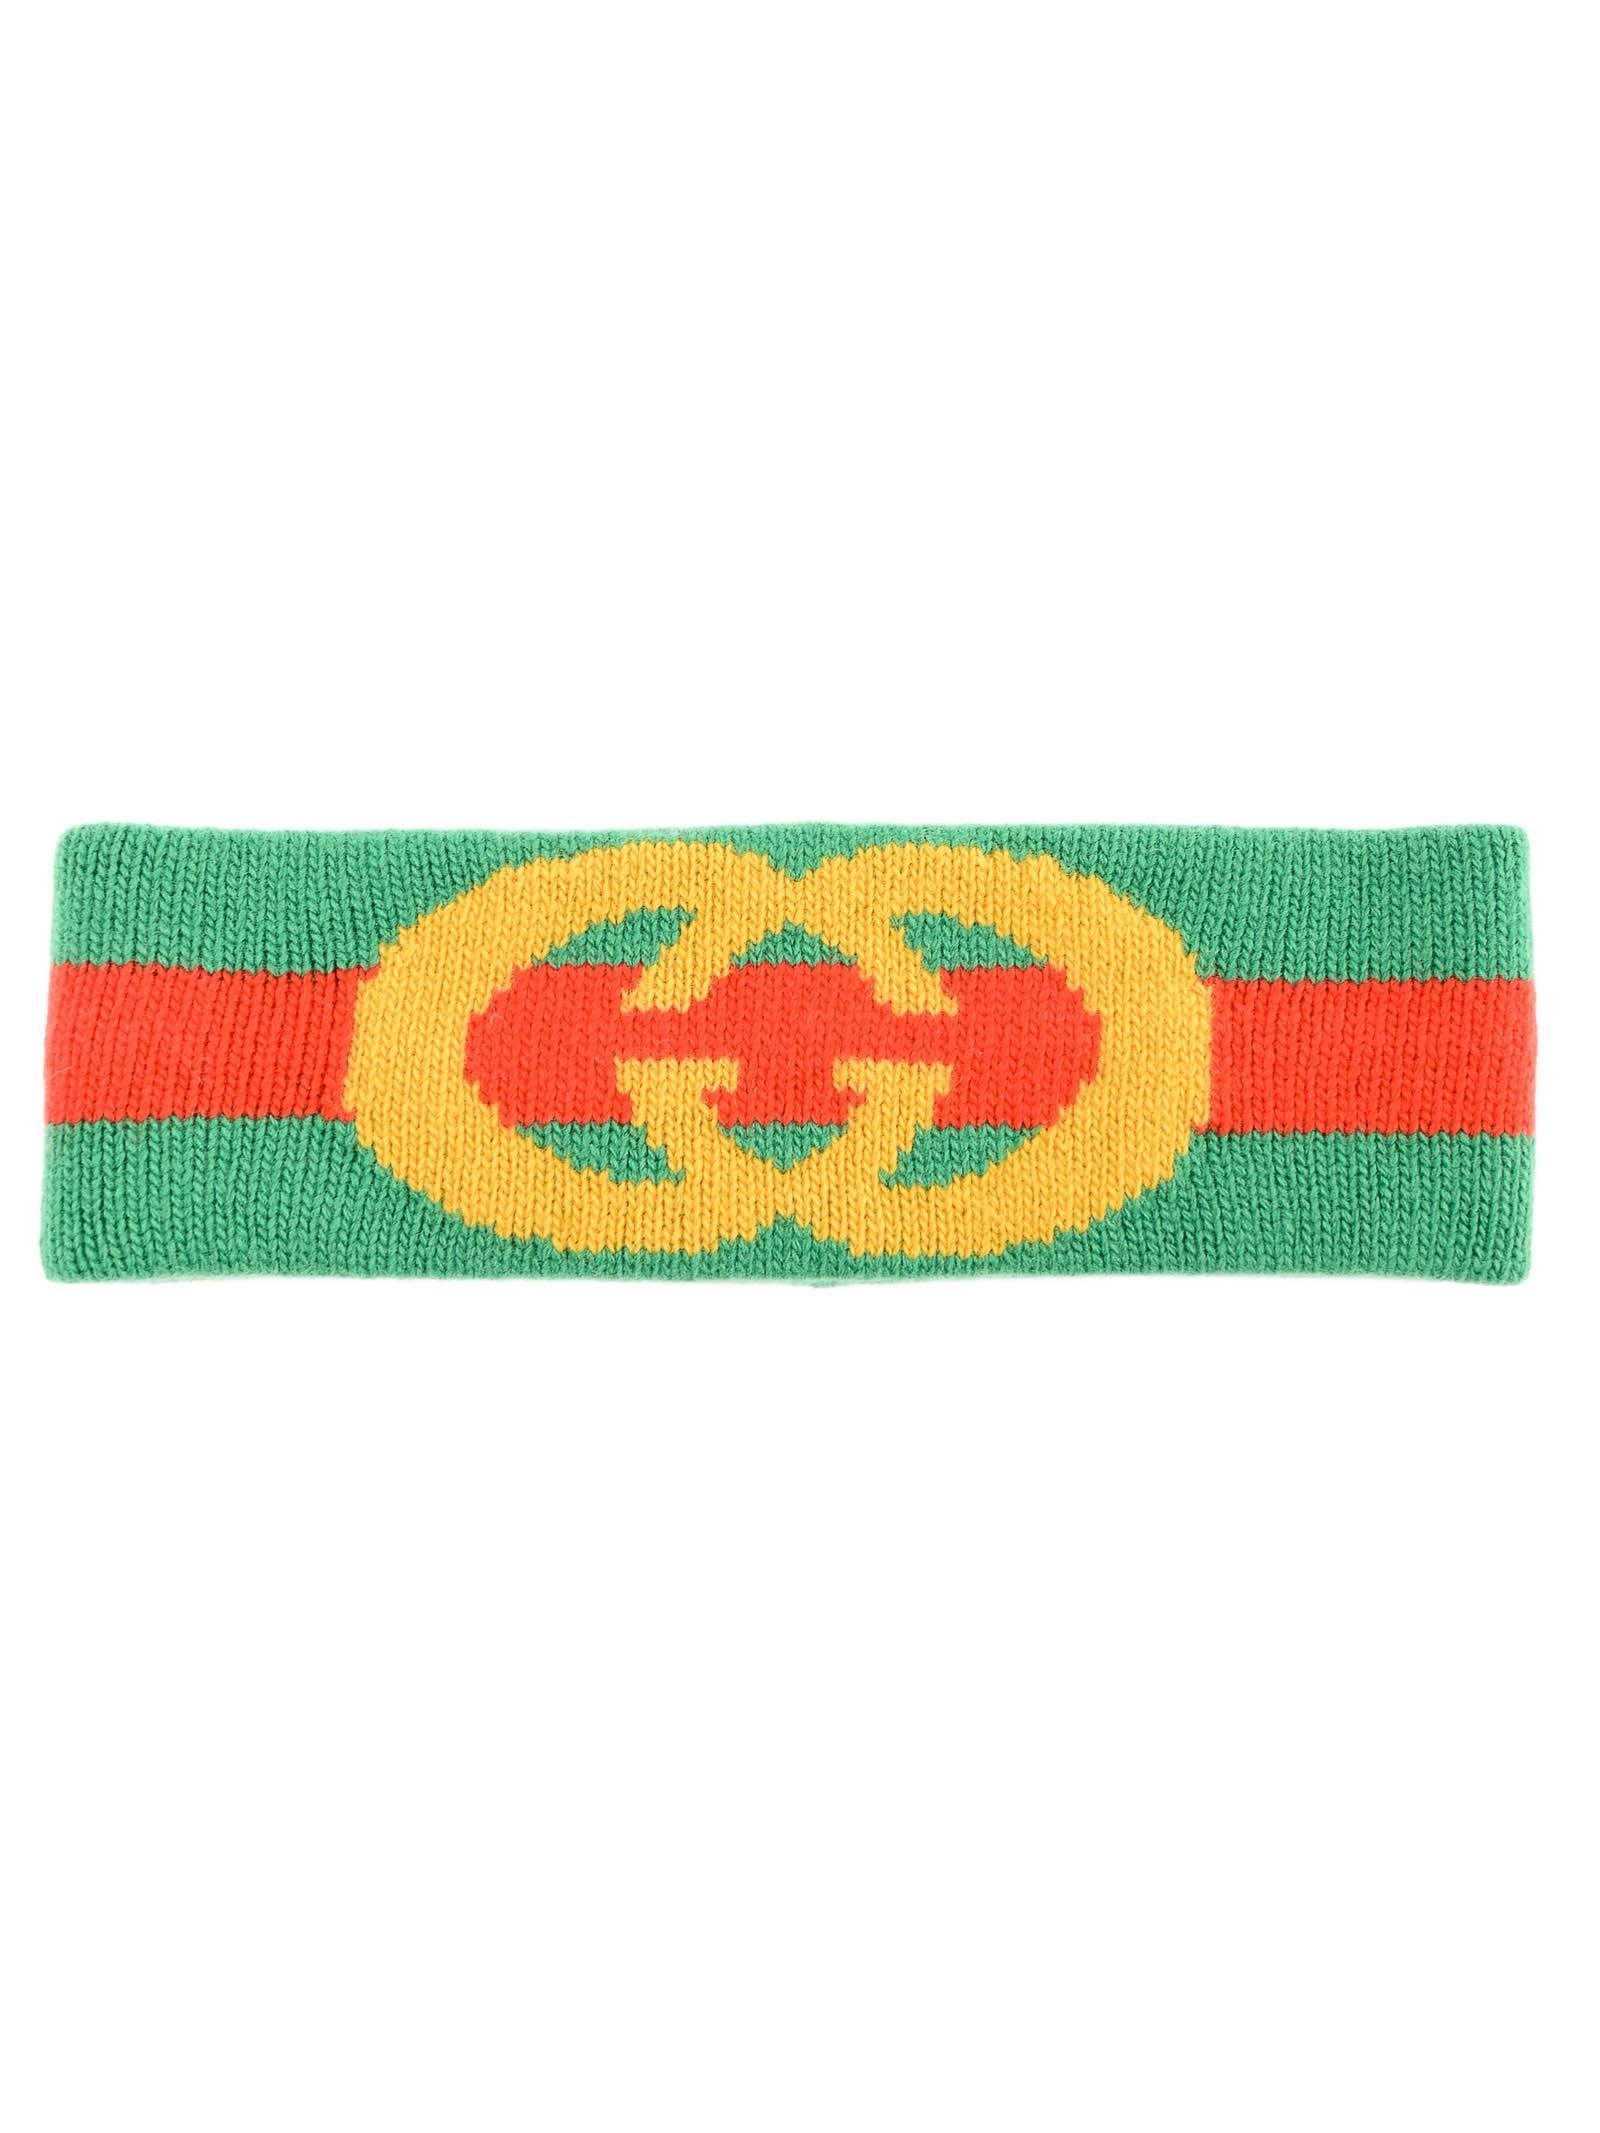 c58f9f87623 Lyst - Gucci Web Wool Headband With Interlocking G in Green - Save 19%